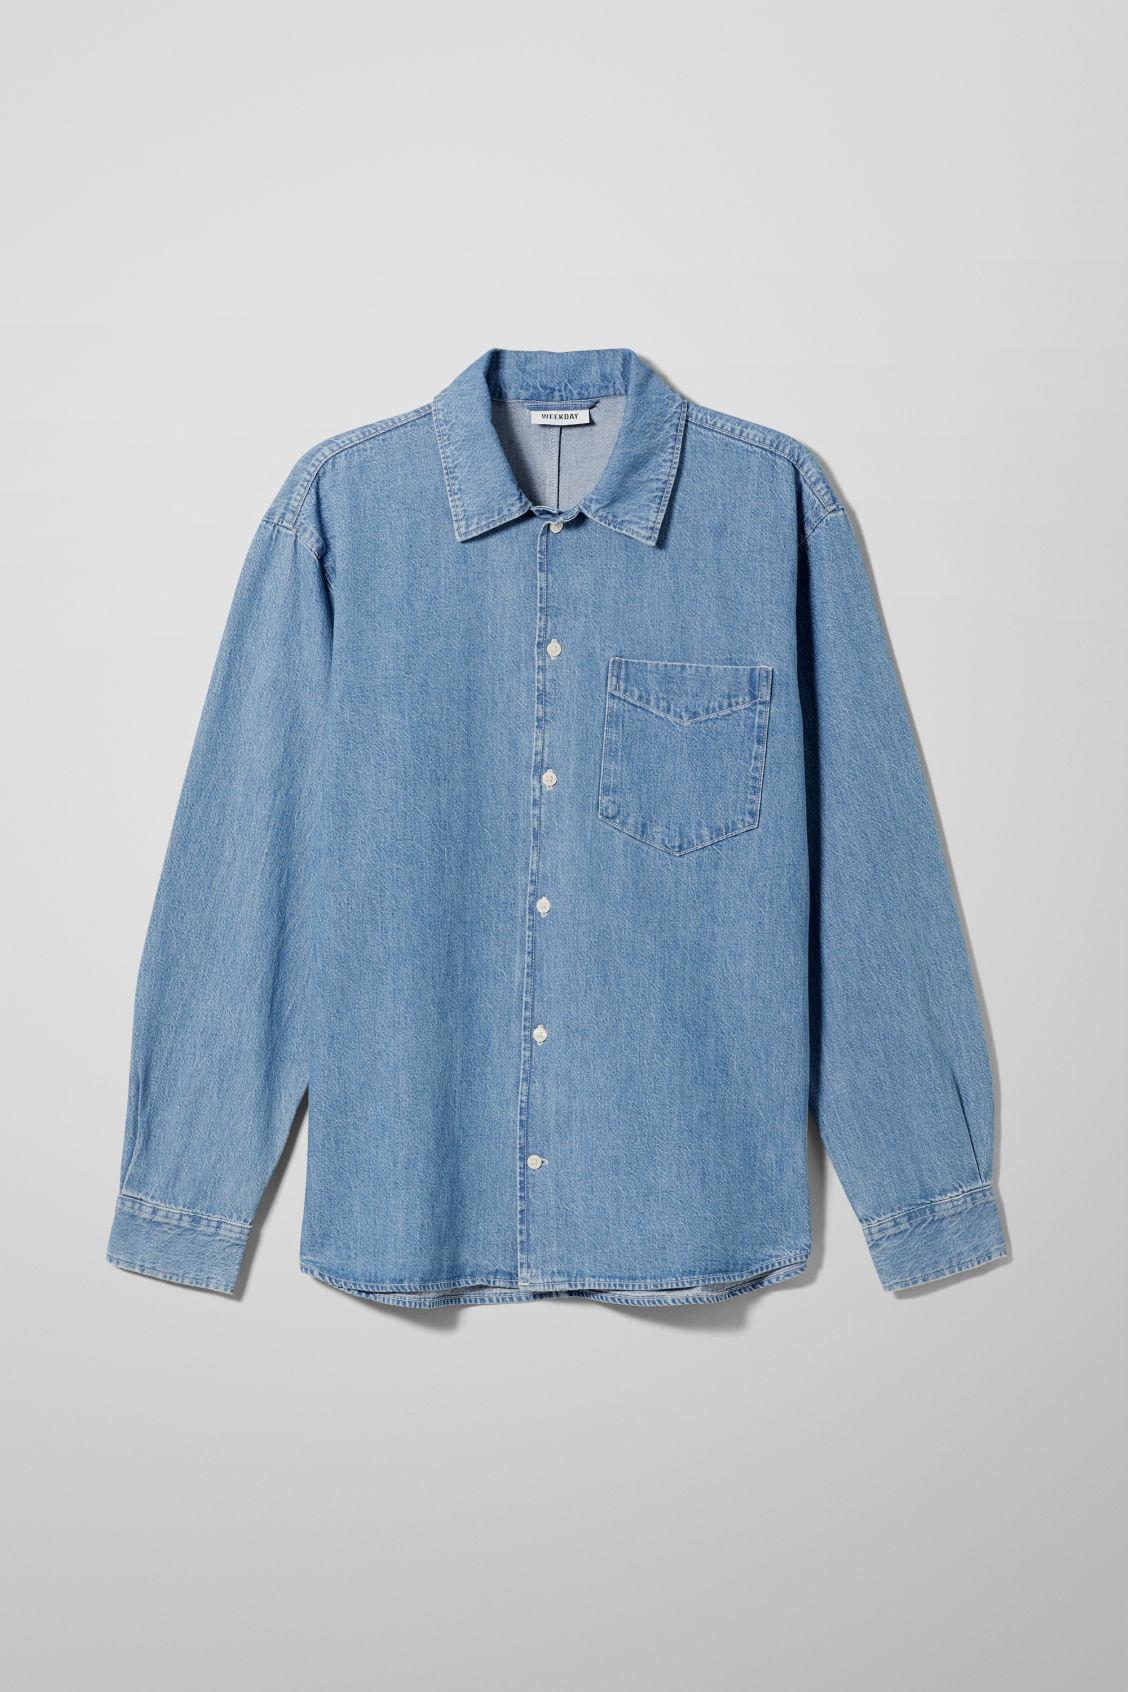 Polly Dream Blue Denim Shirt - Blue